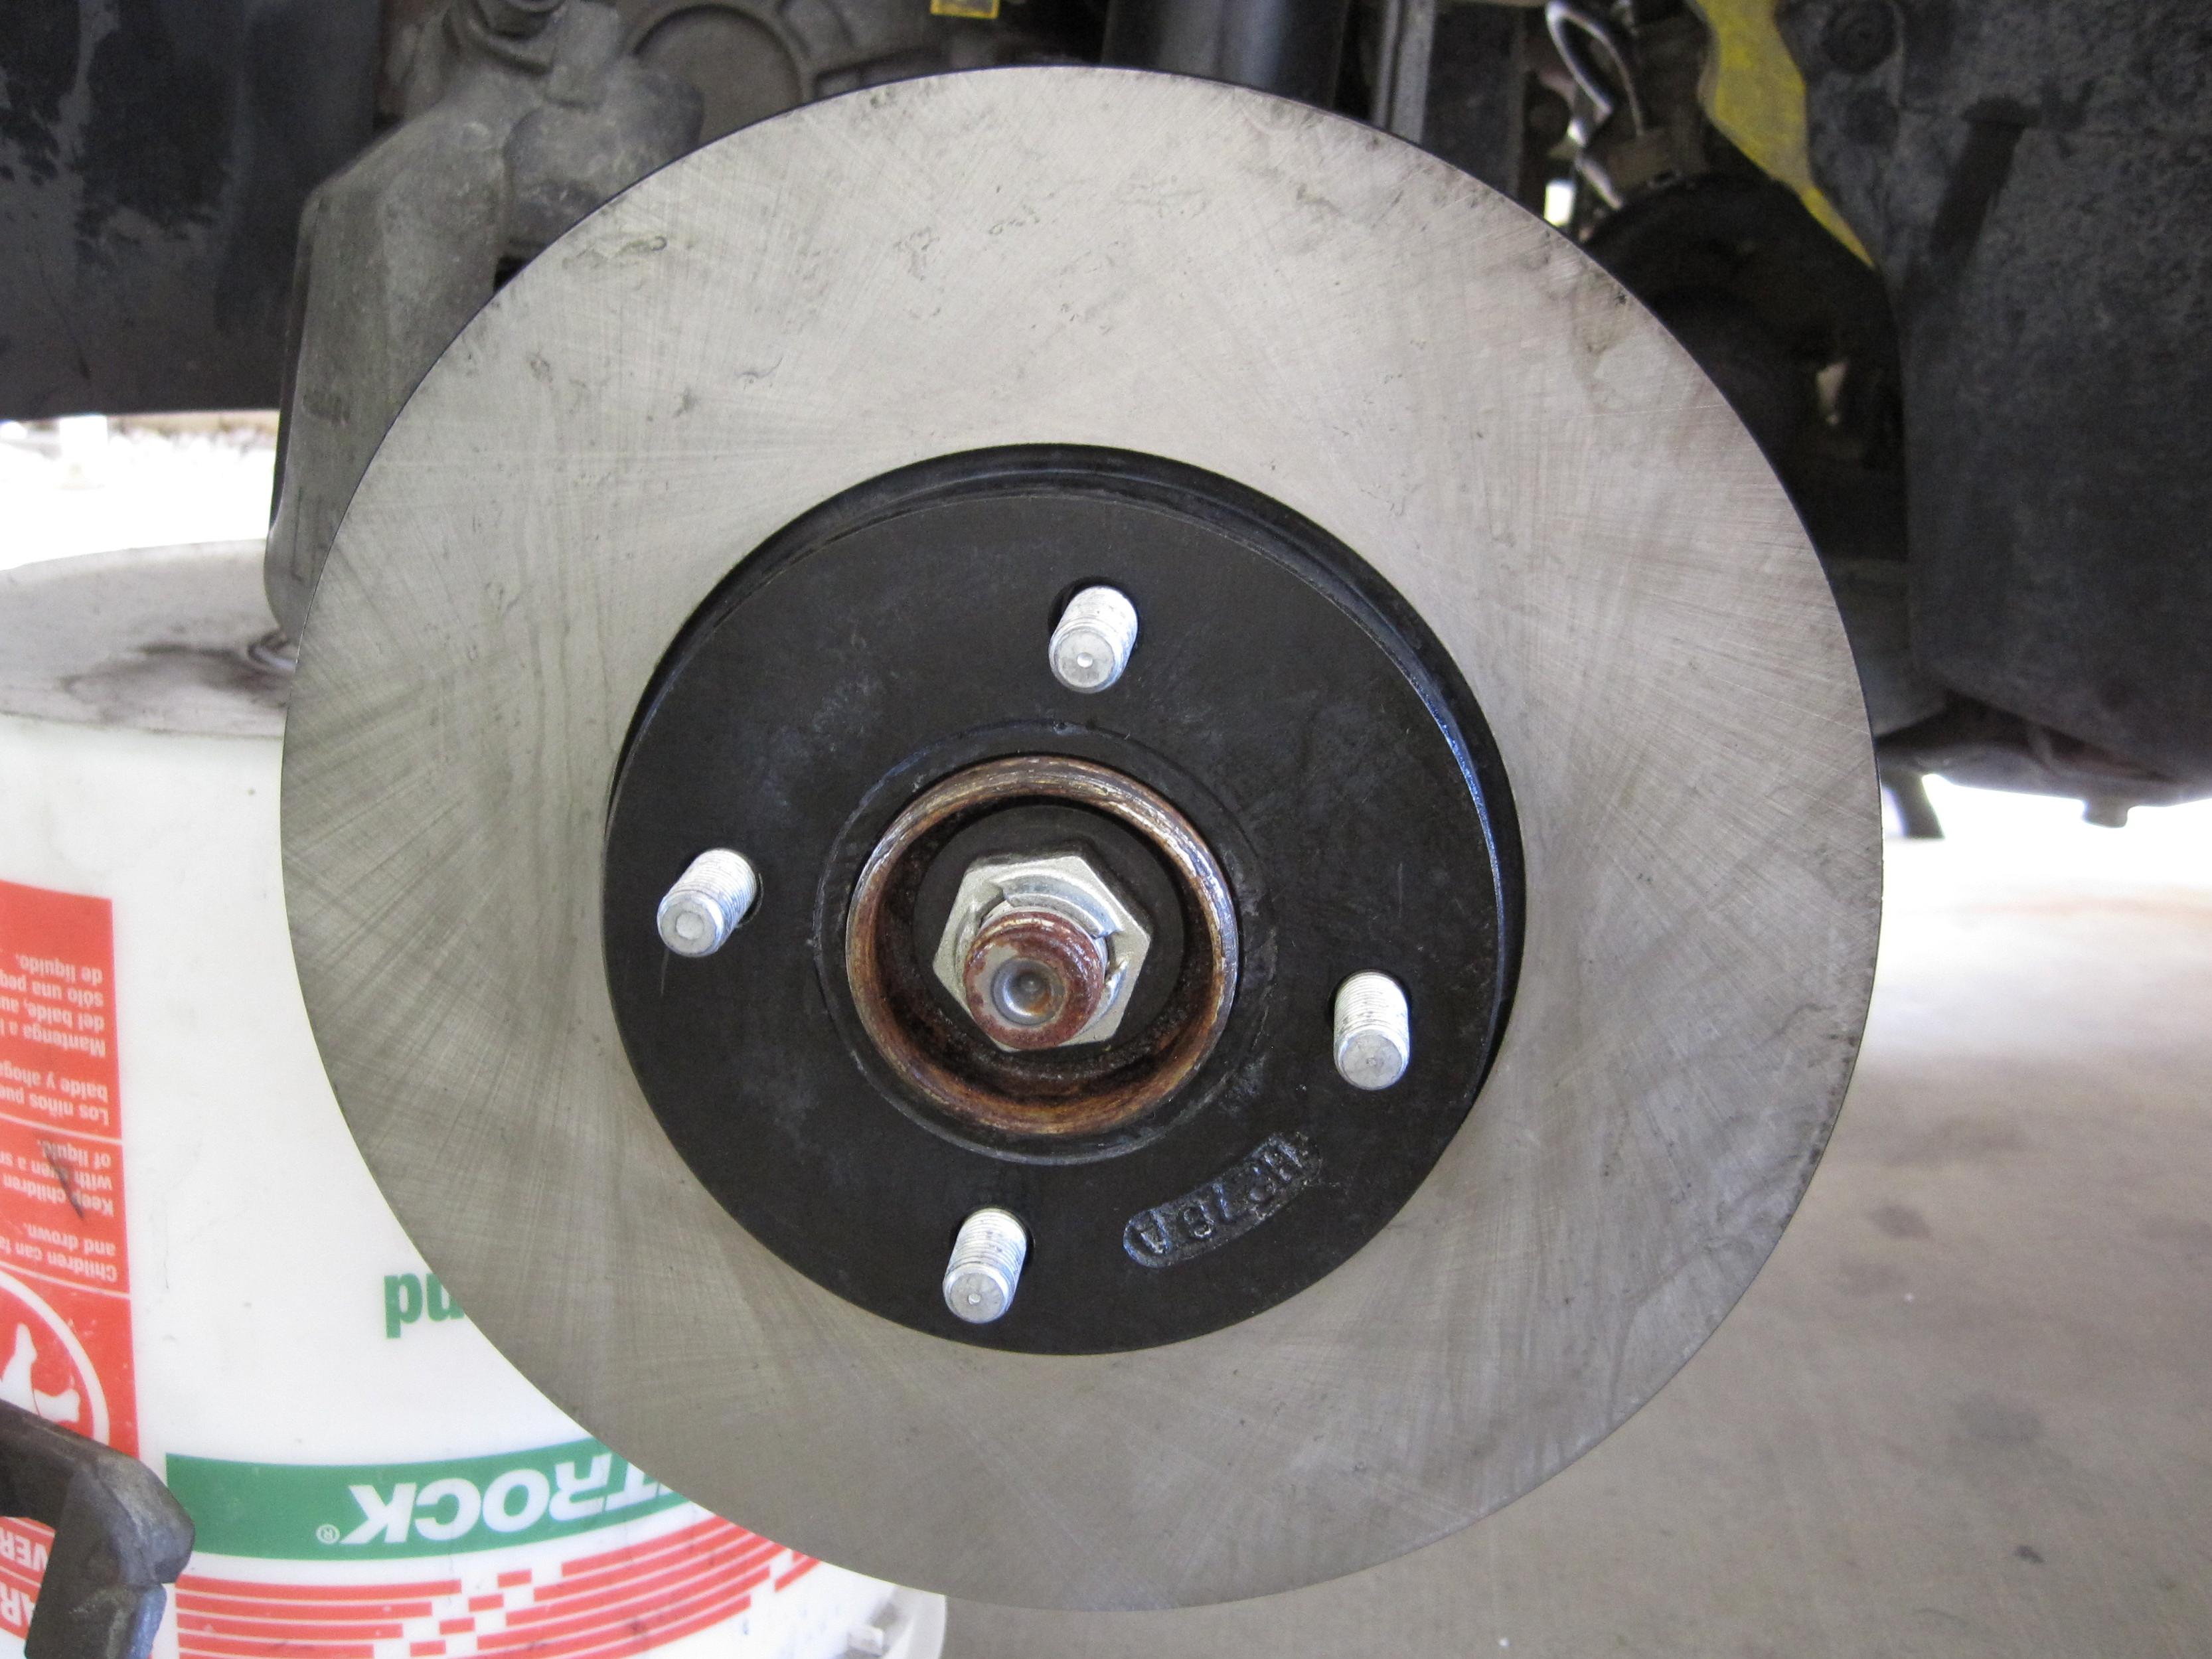 2005-2007 Ford Focus Front Brake Rotors Replacement (2005, 2006, 2007) -  iFixit Repair Guide